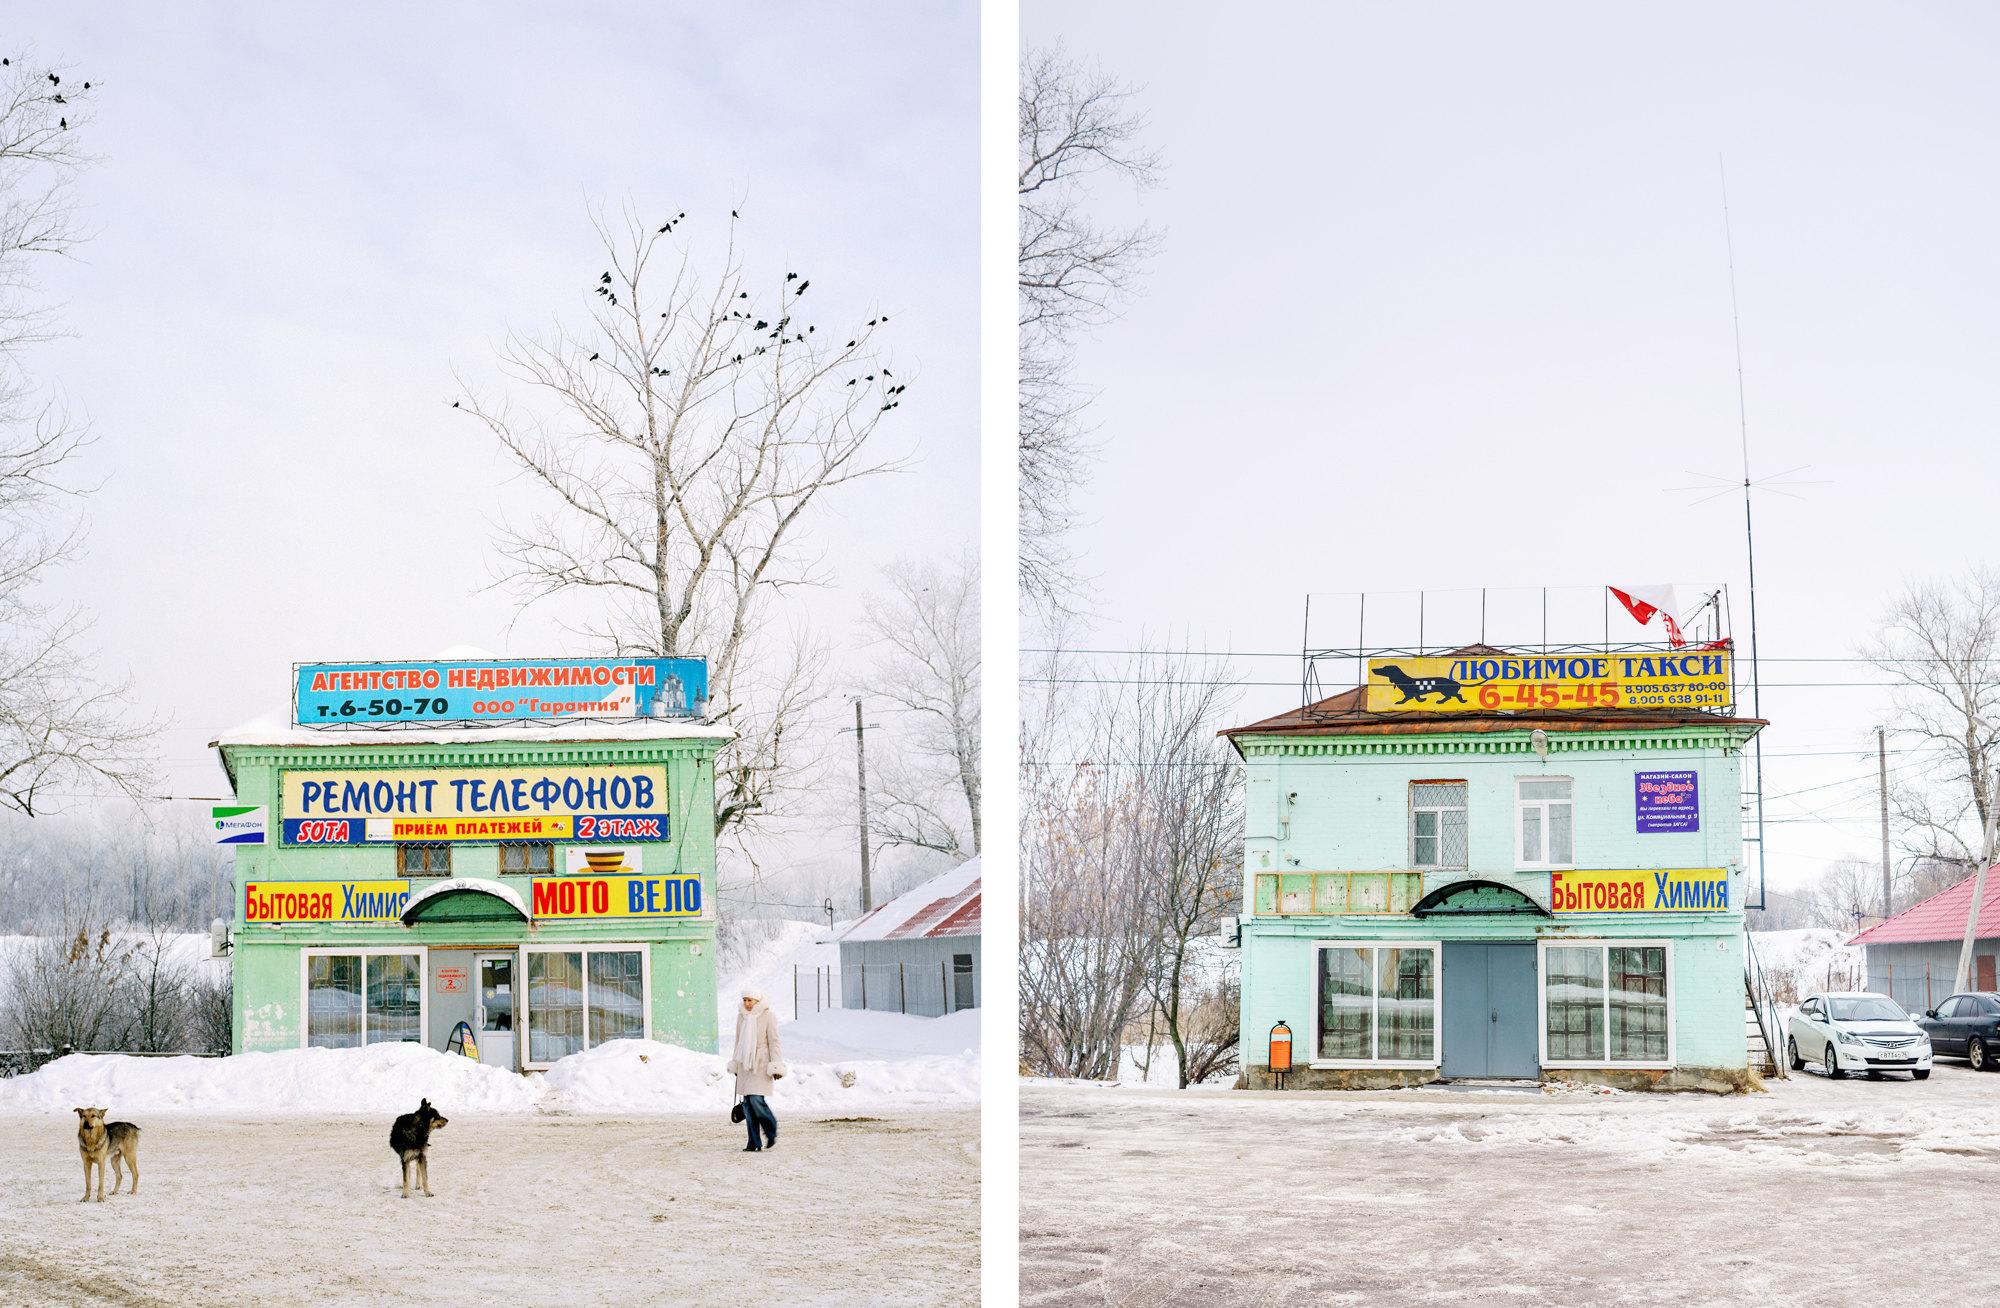 Магазин. Работа Александра Гронского